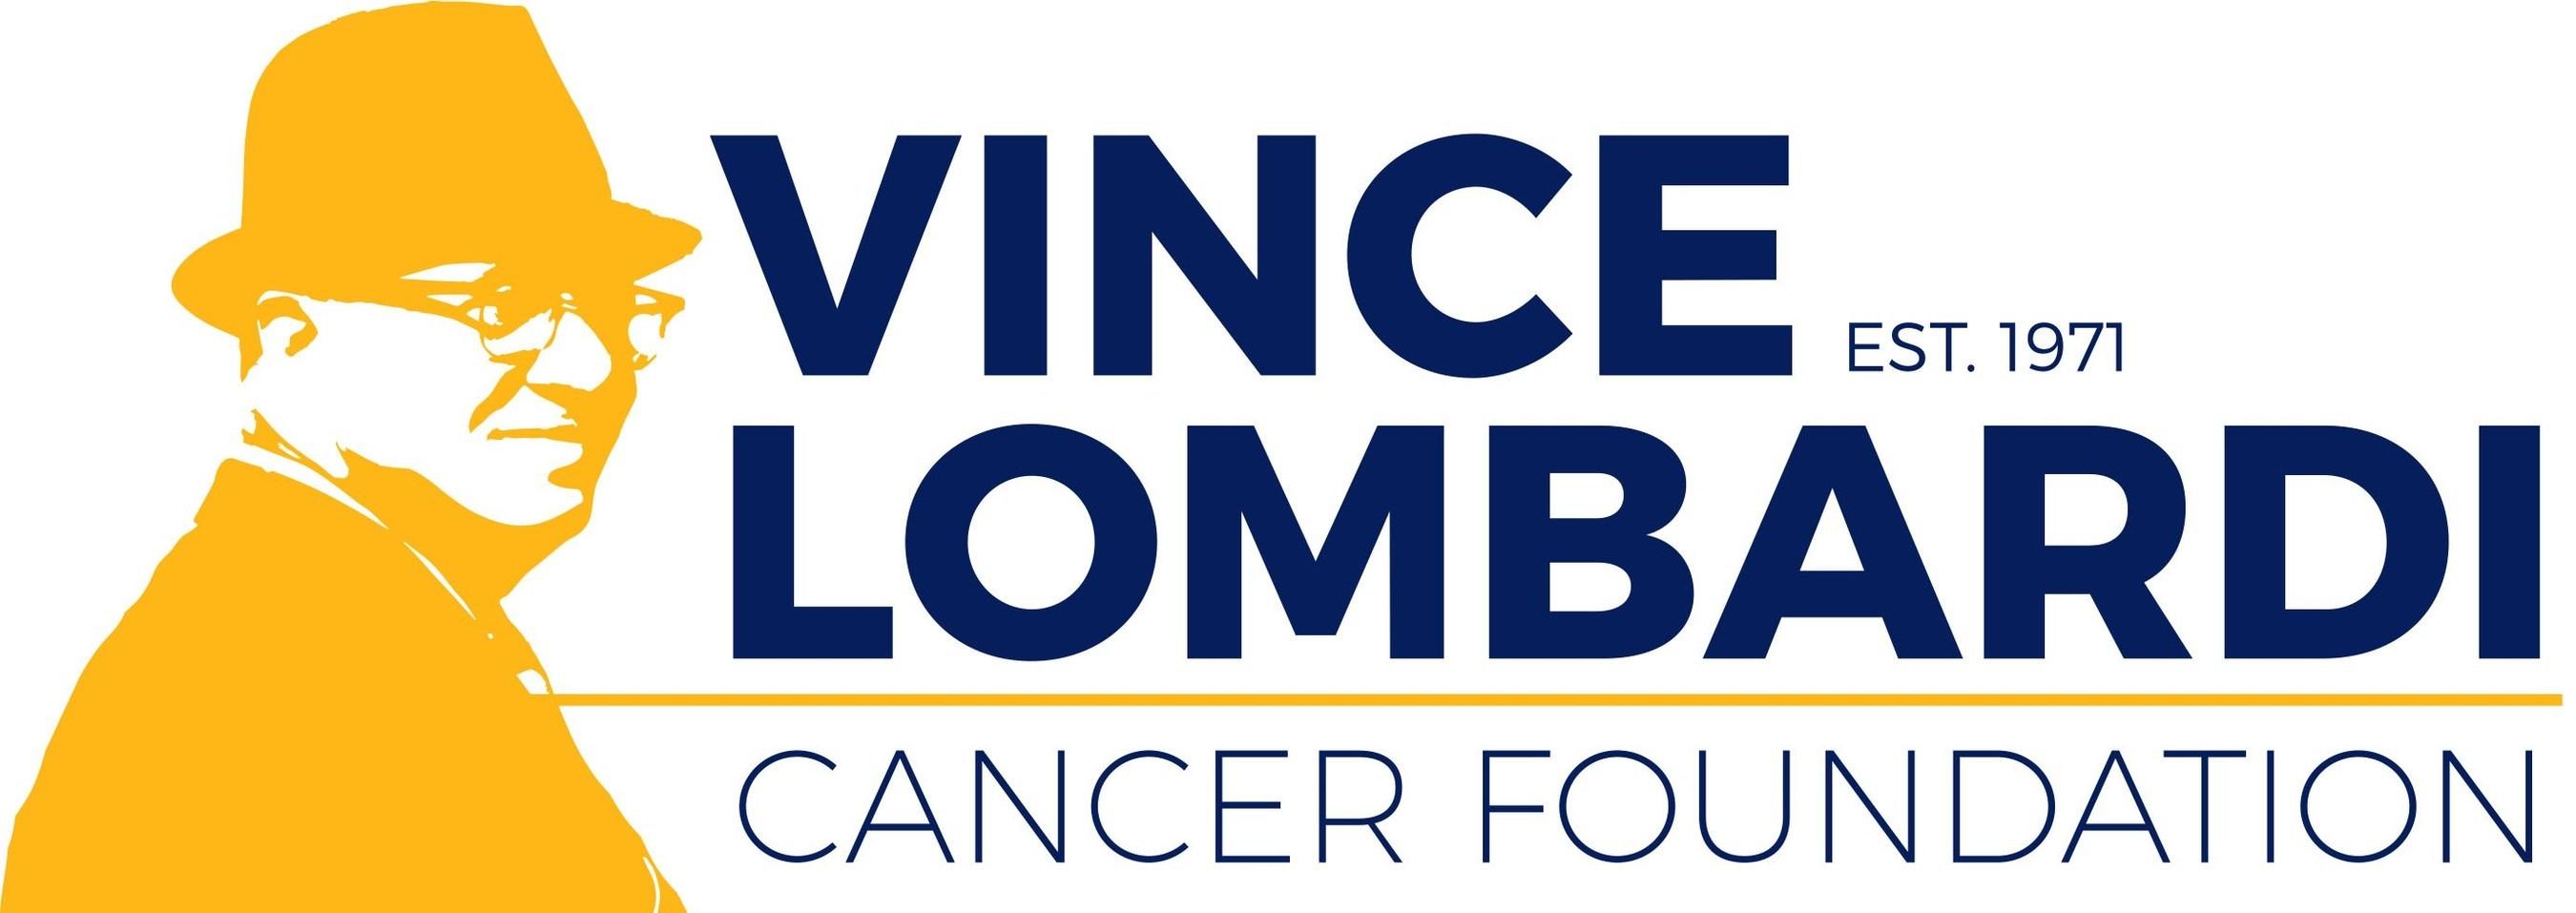 Vince Lombardi Cancer Foundation logo